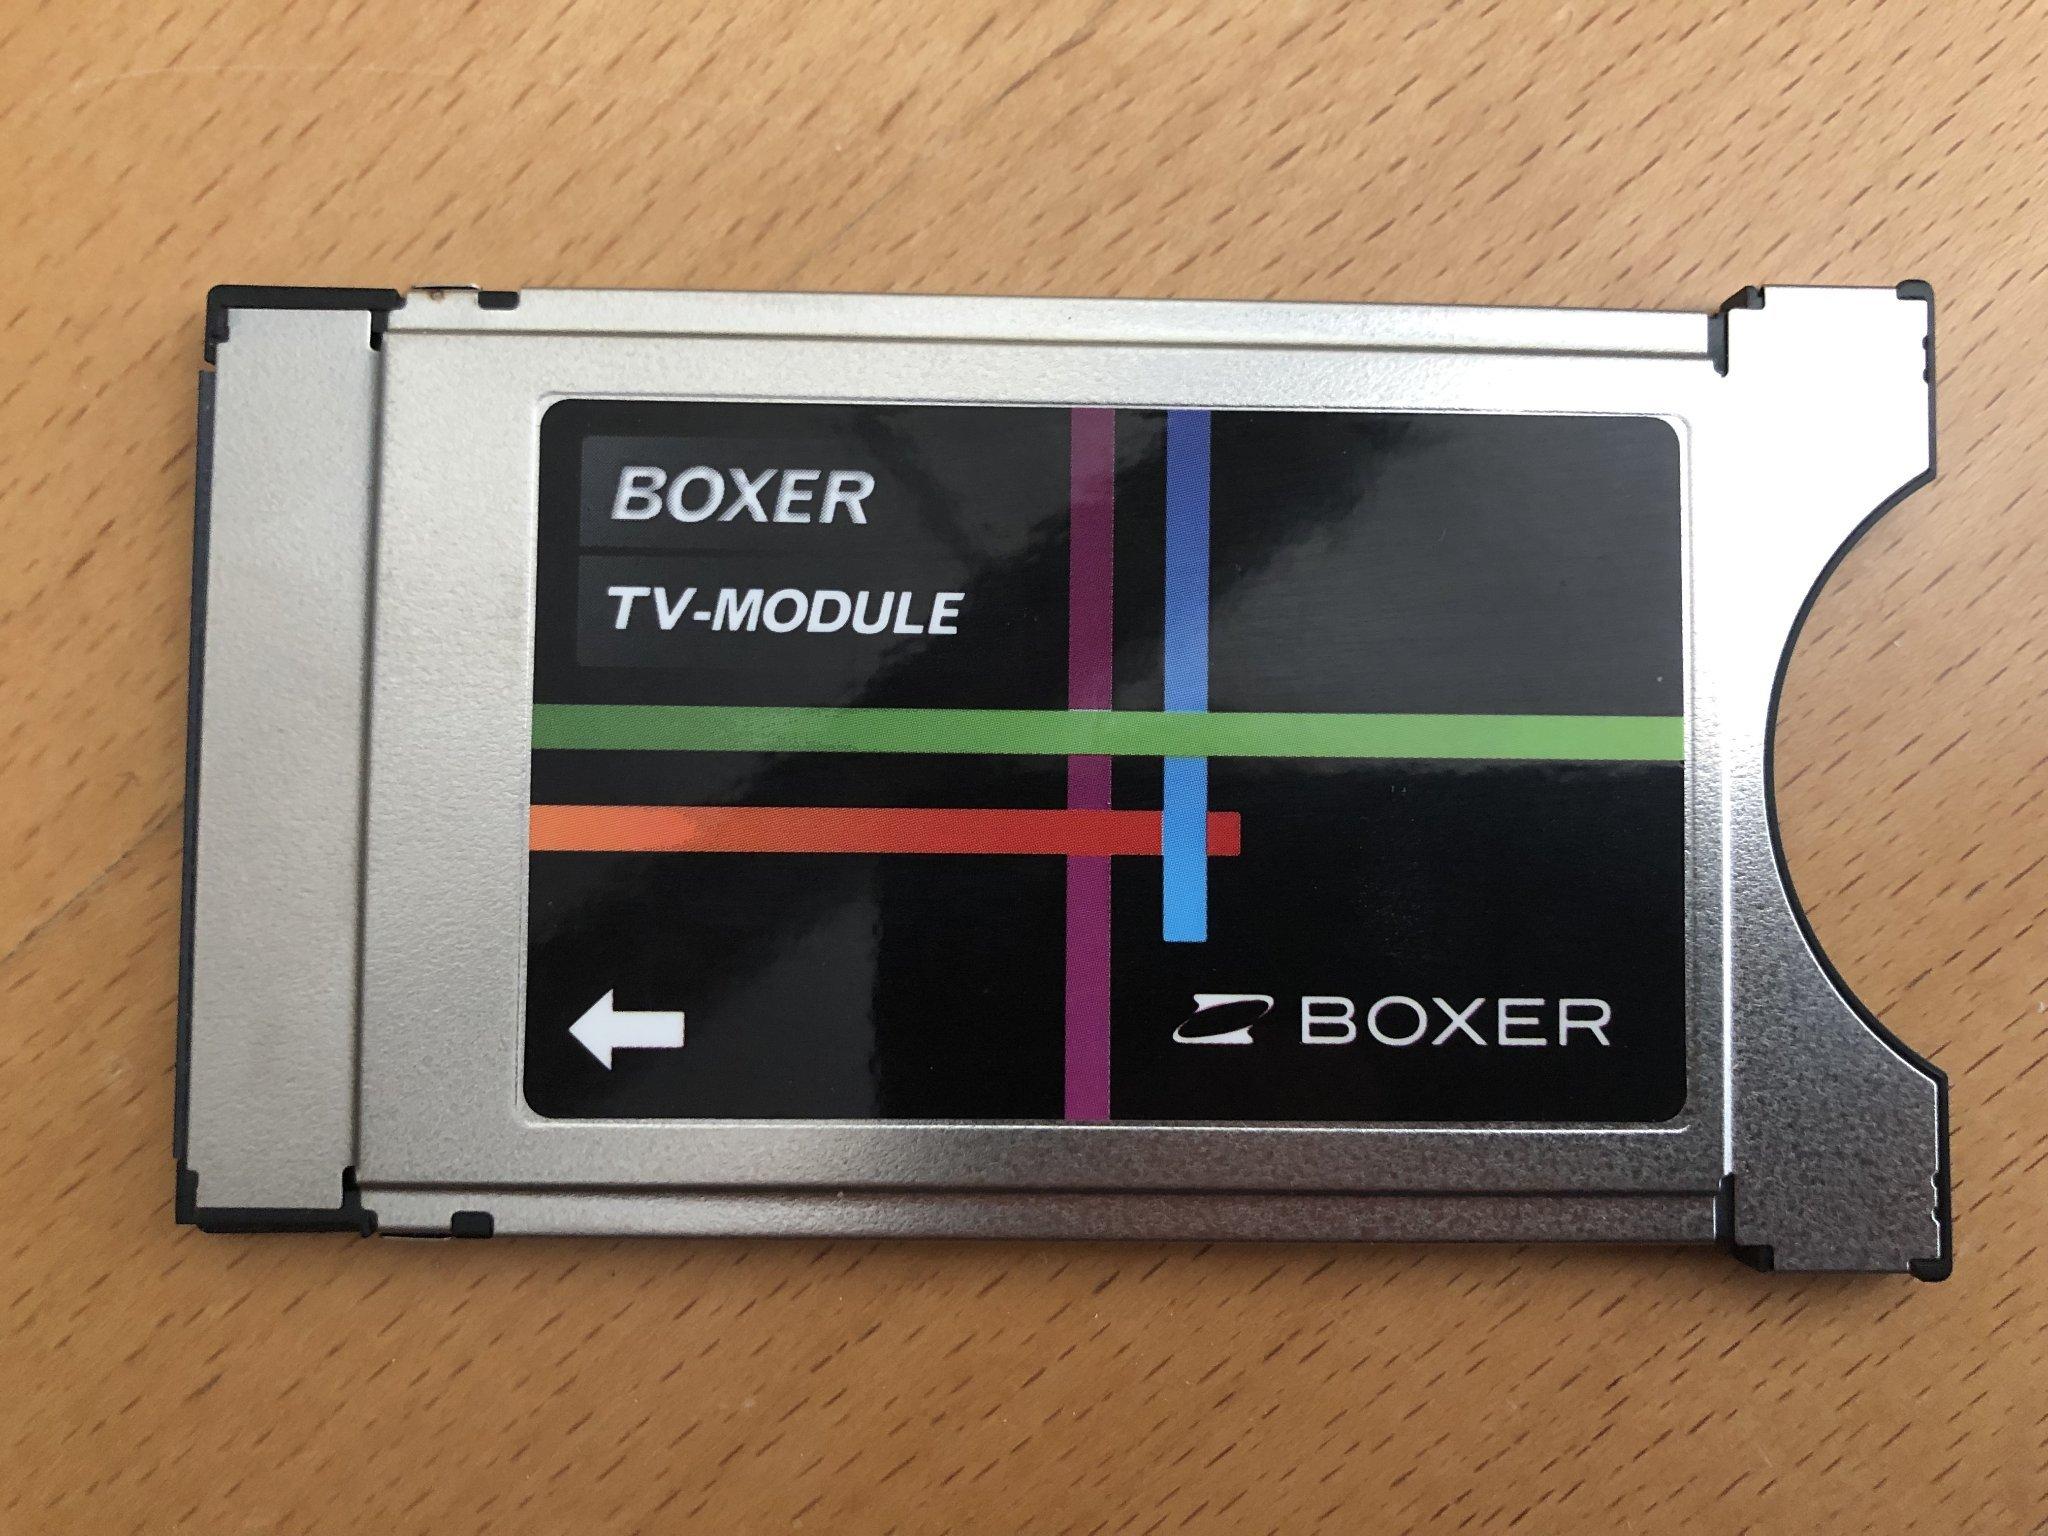 Velsete Boxer CA-Modul, Viaccess med MPEG4 kortläsare f.. (349716267) ᐈ YM-03